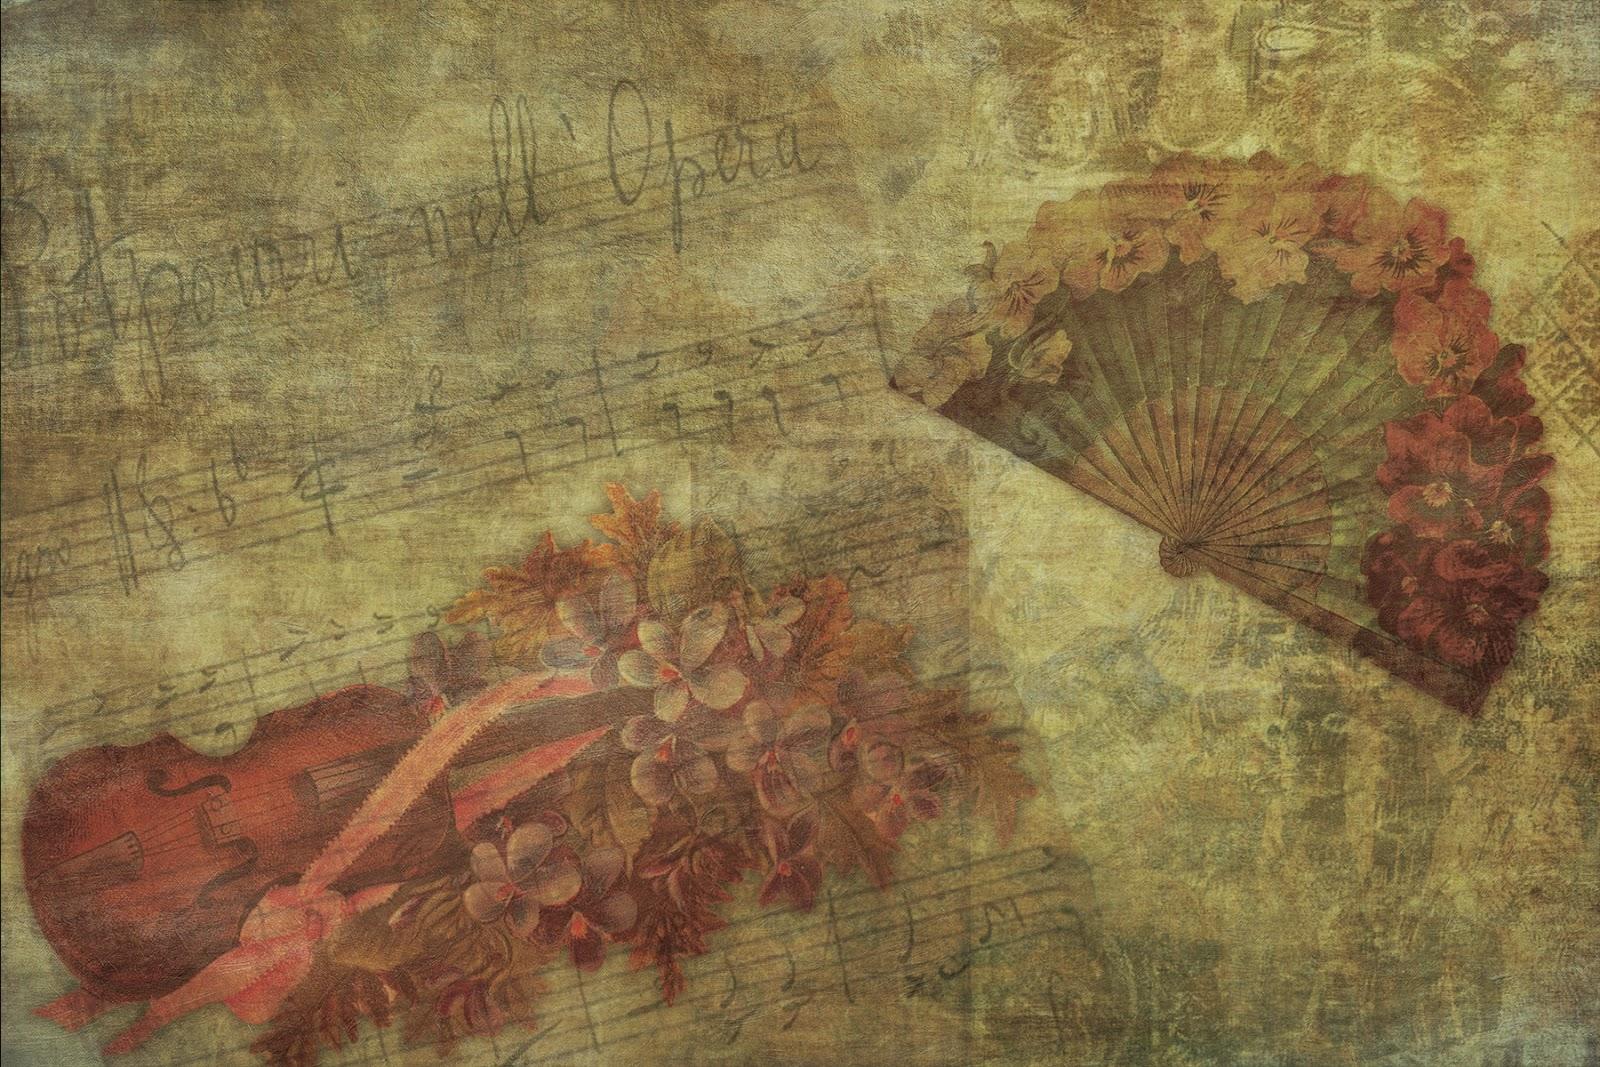 free violin images